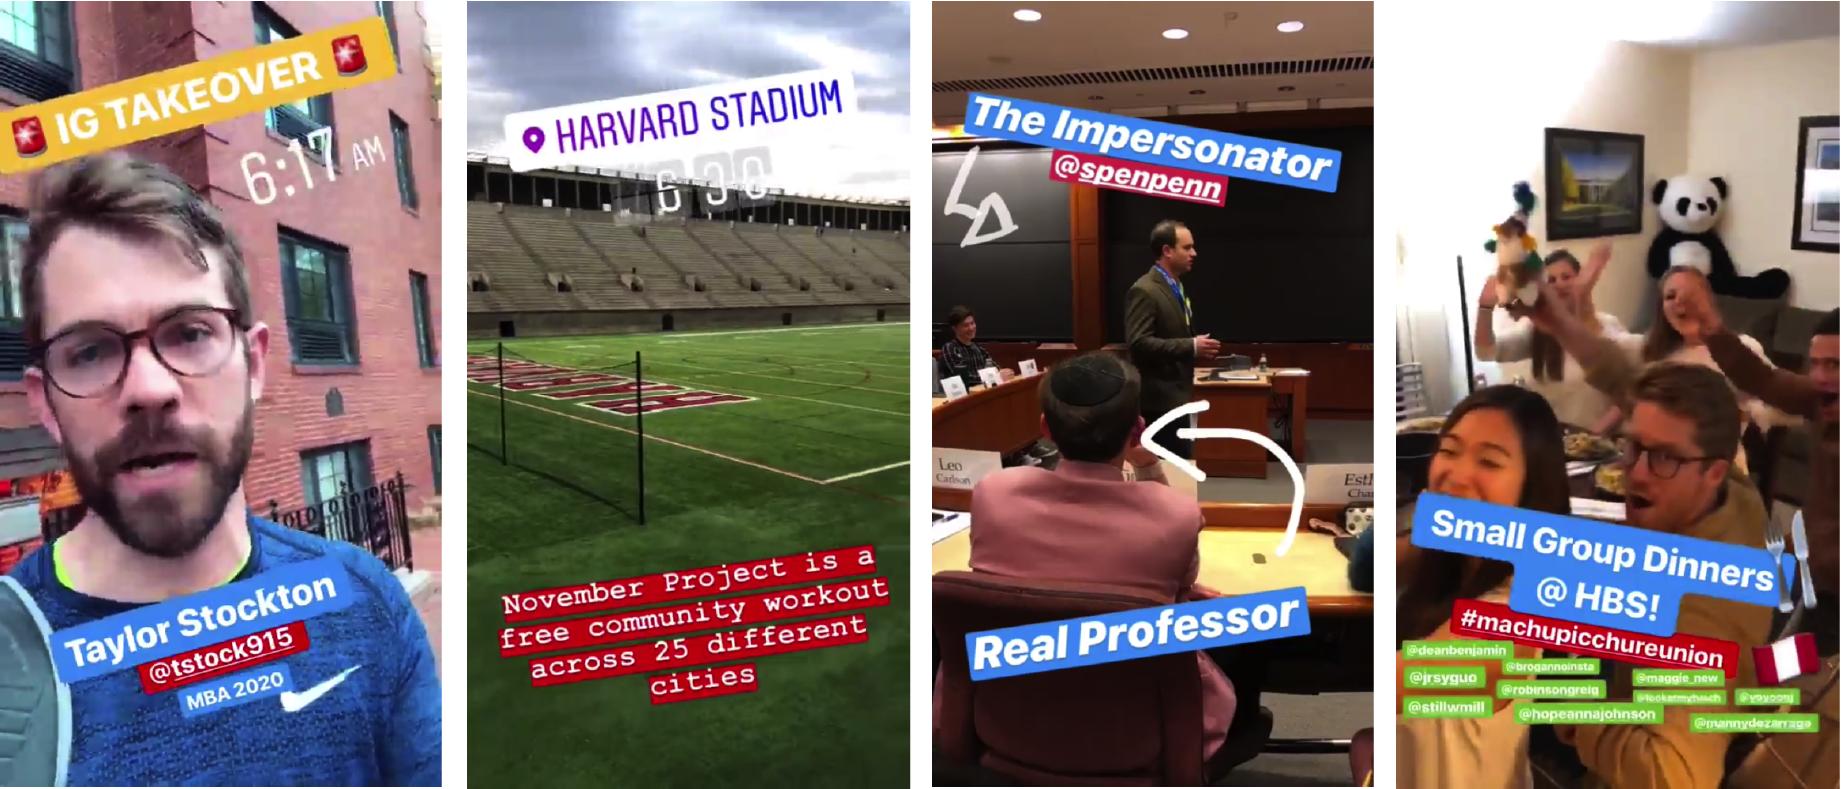 Instagram Takeover - Taylor Stockton (MBA 2020)